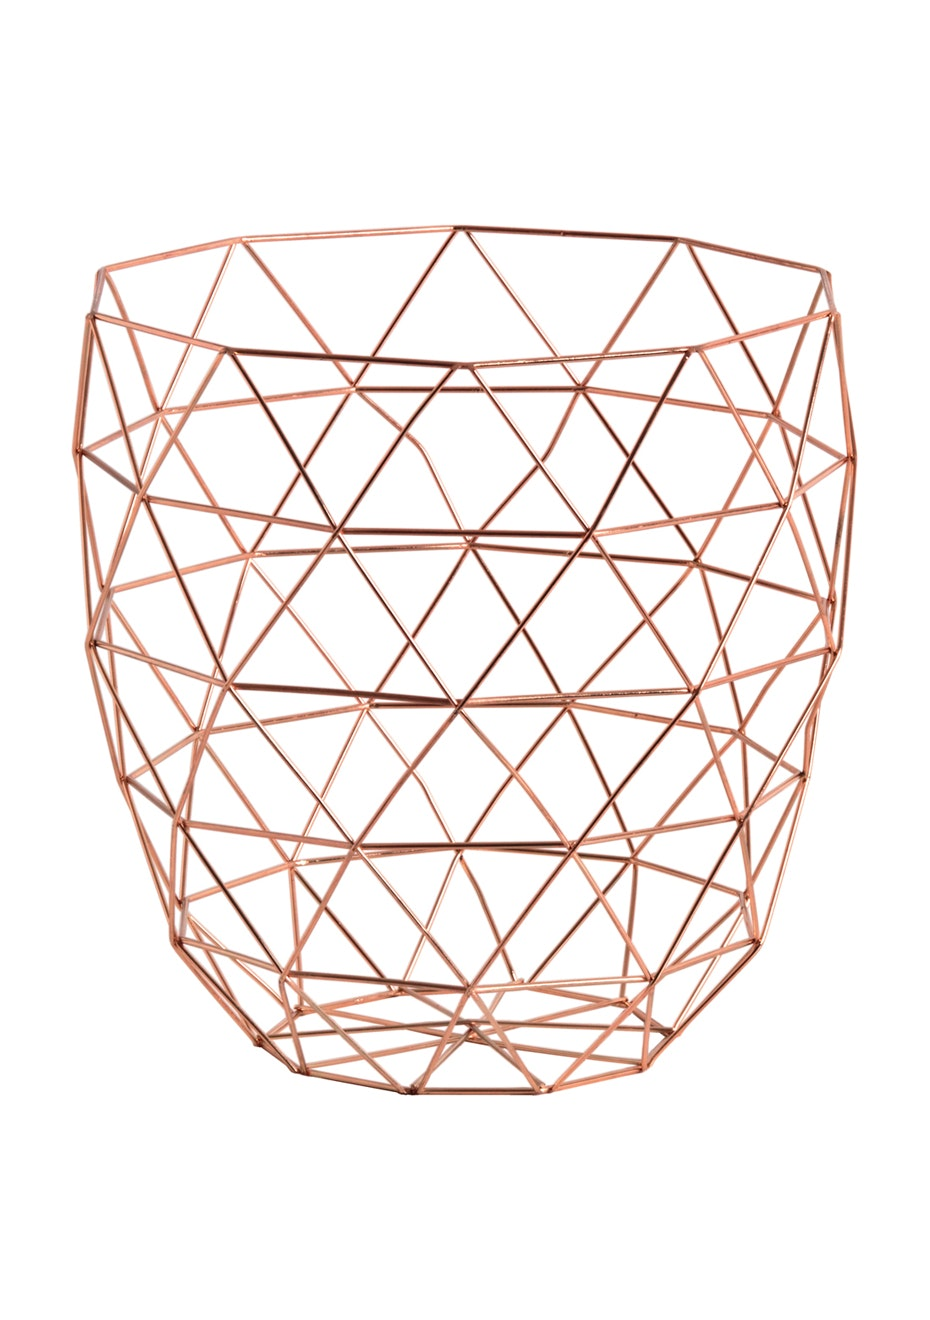 Jason - Copper storage basket - Copper